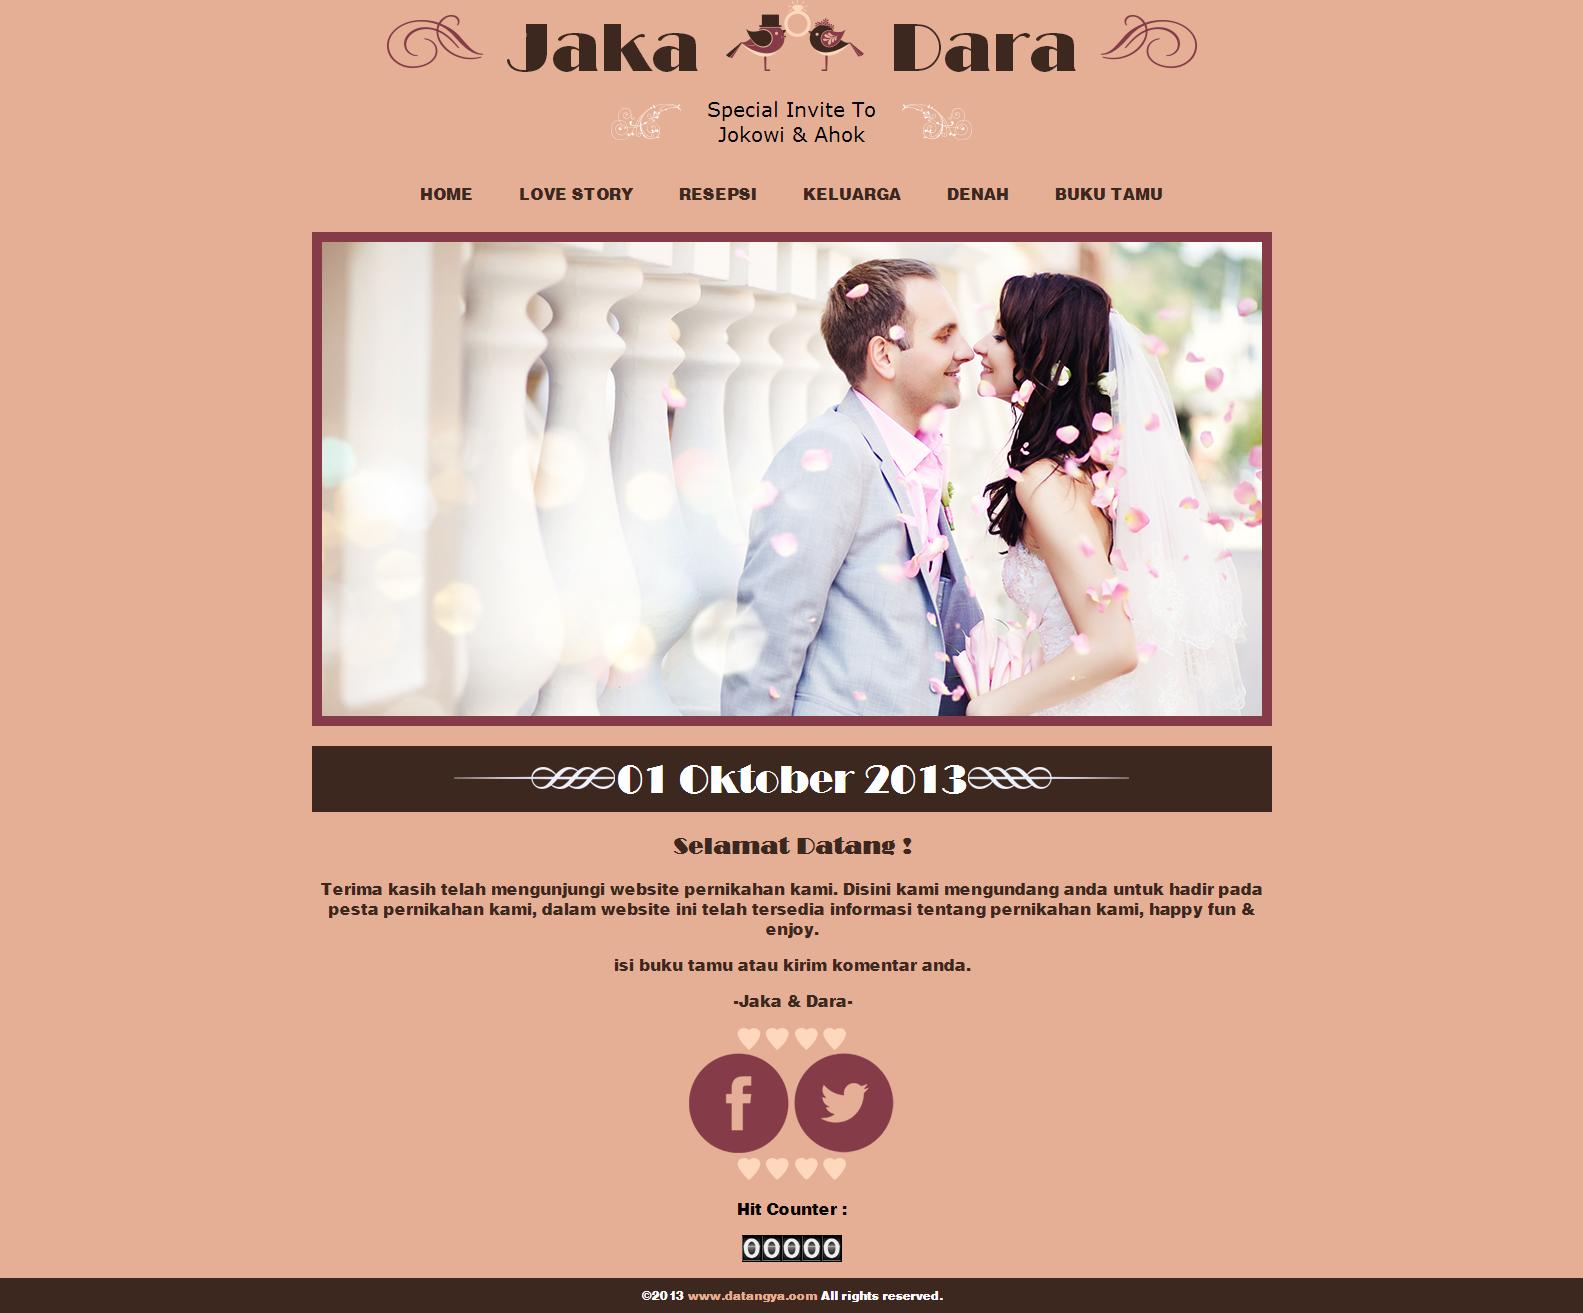 Undangan pernikahan online desain undangan online luxury datangya